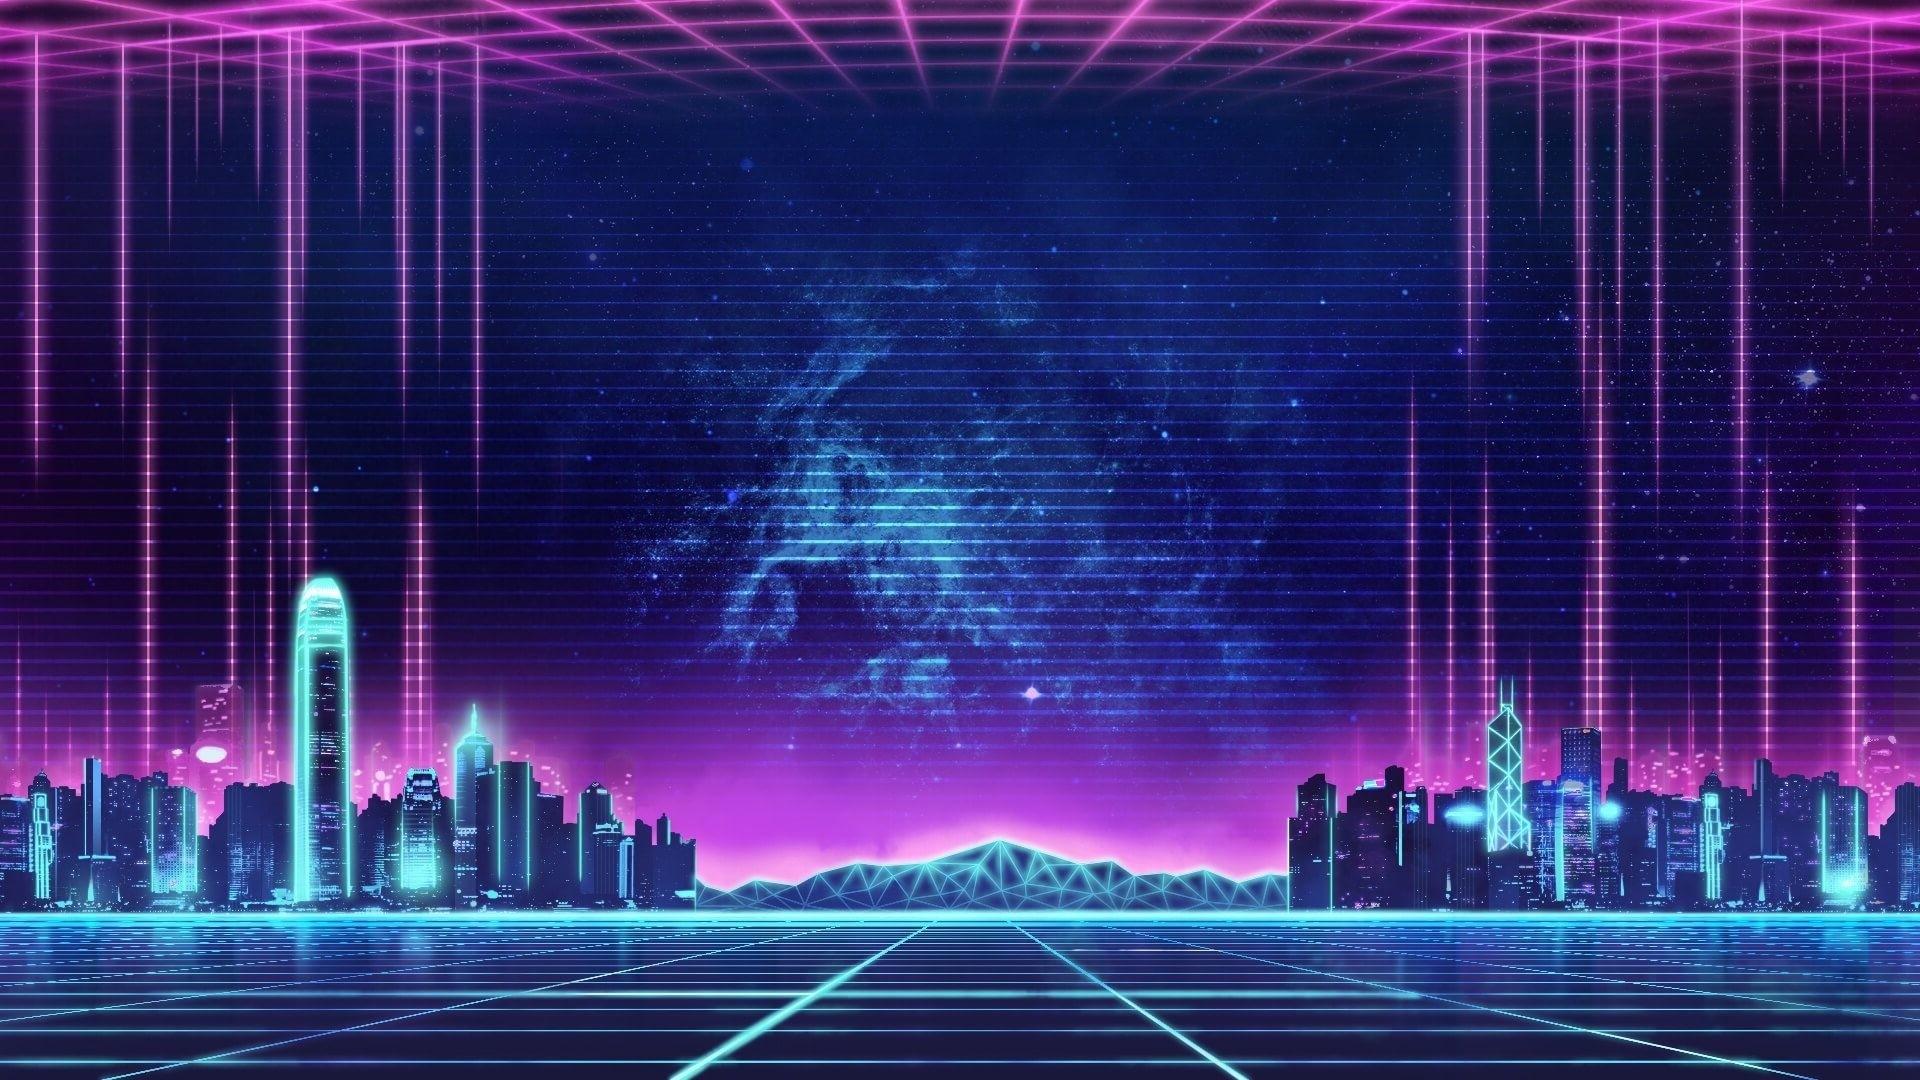 Neon City New Wallpaper